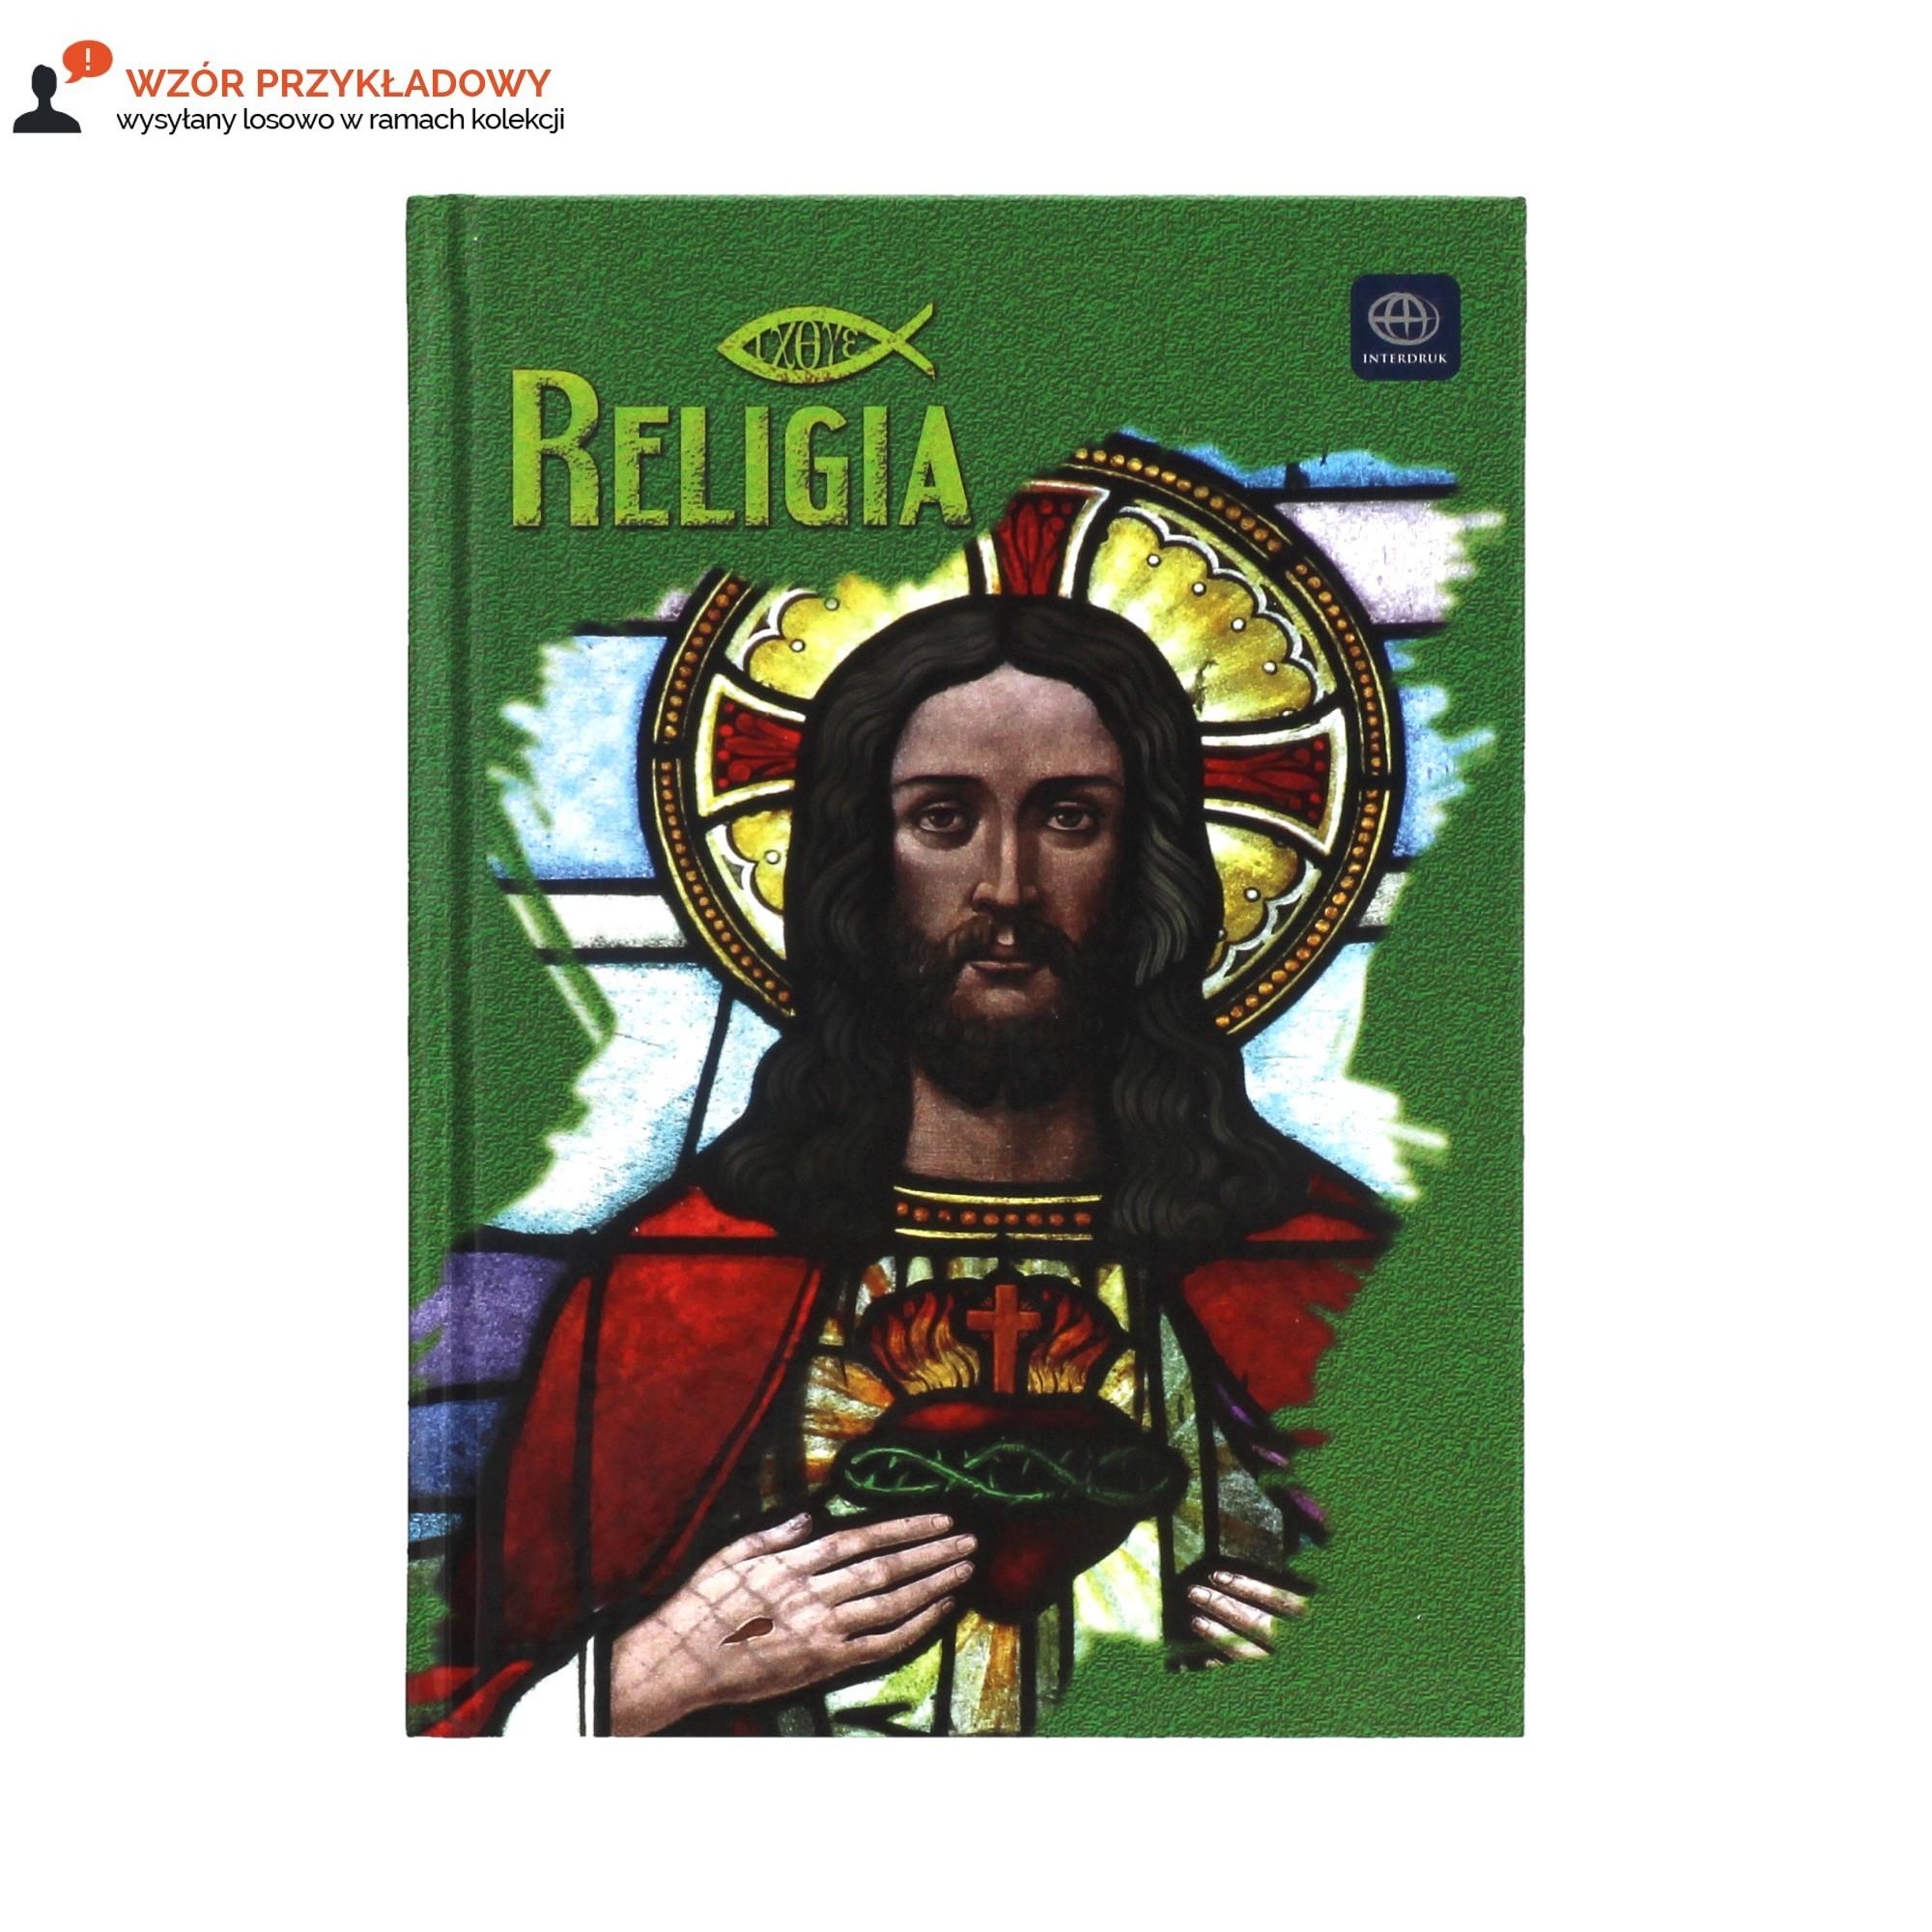 Brulion A5/64 kratka religia Interdruk